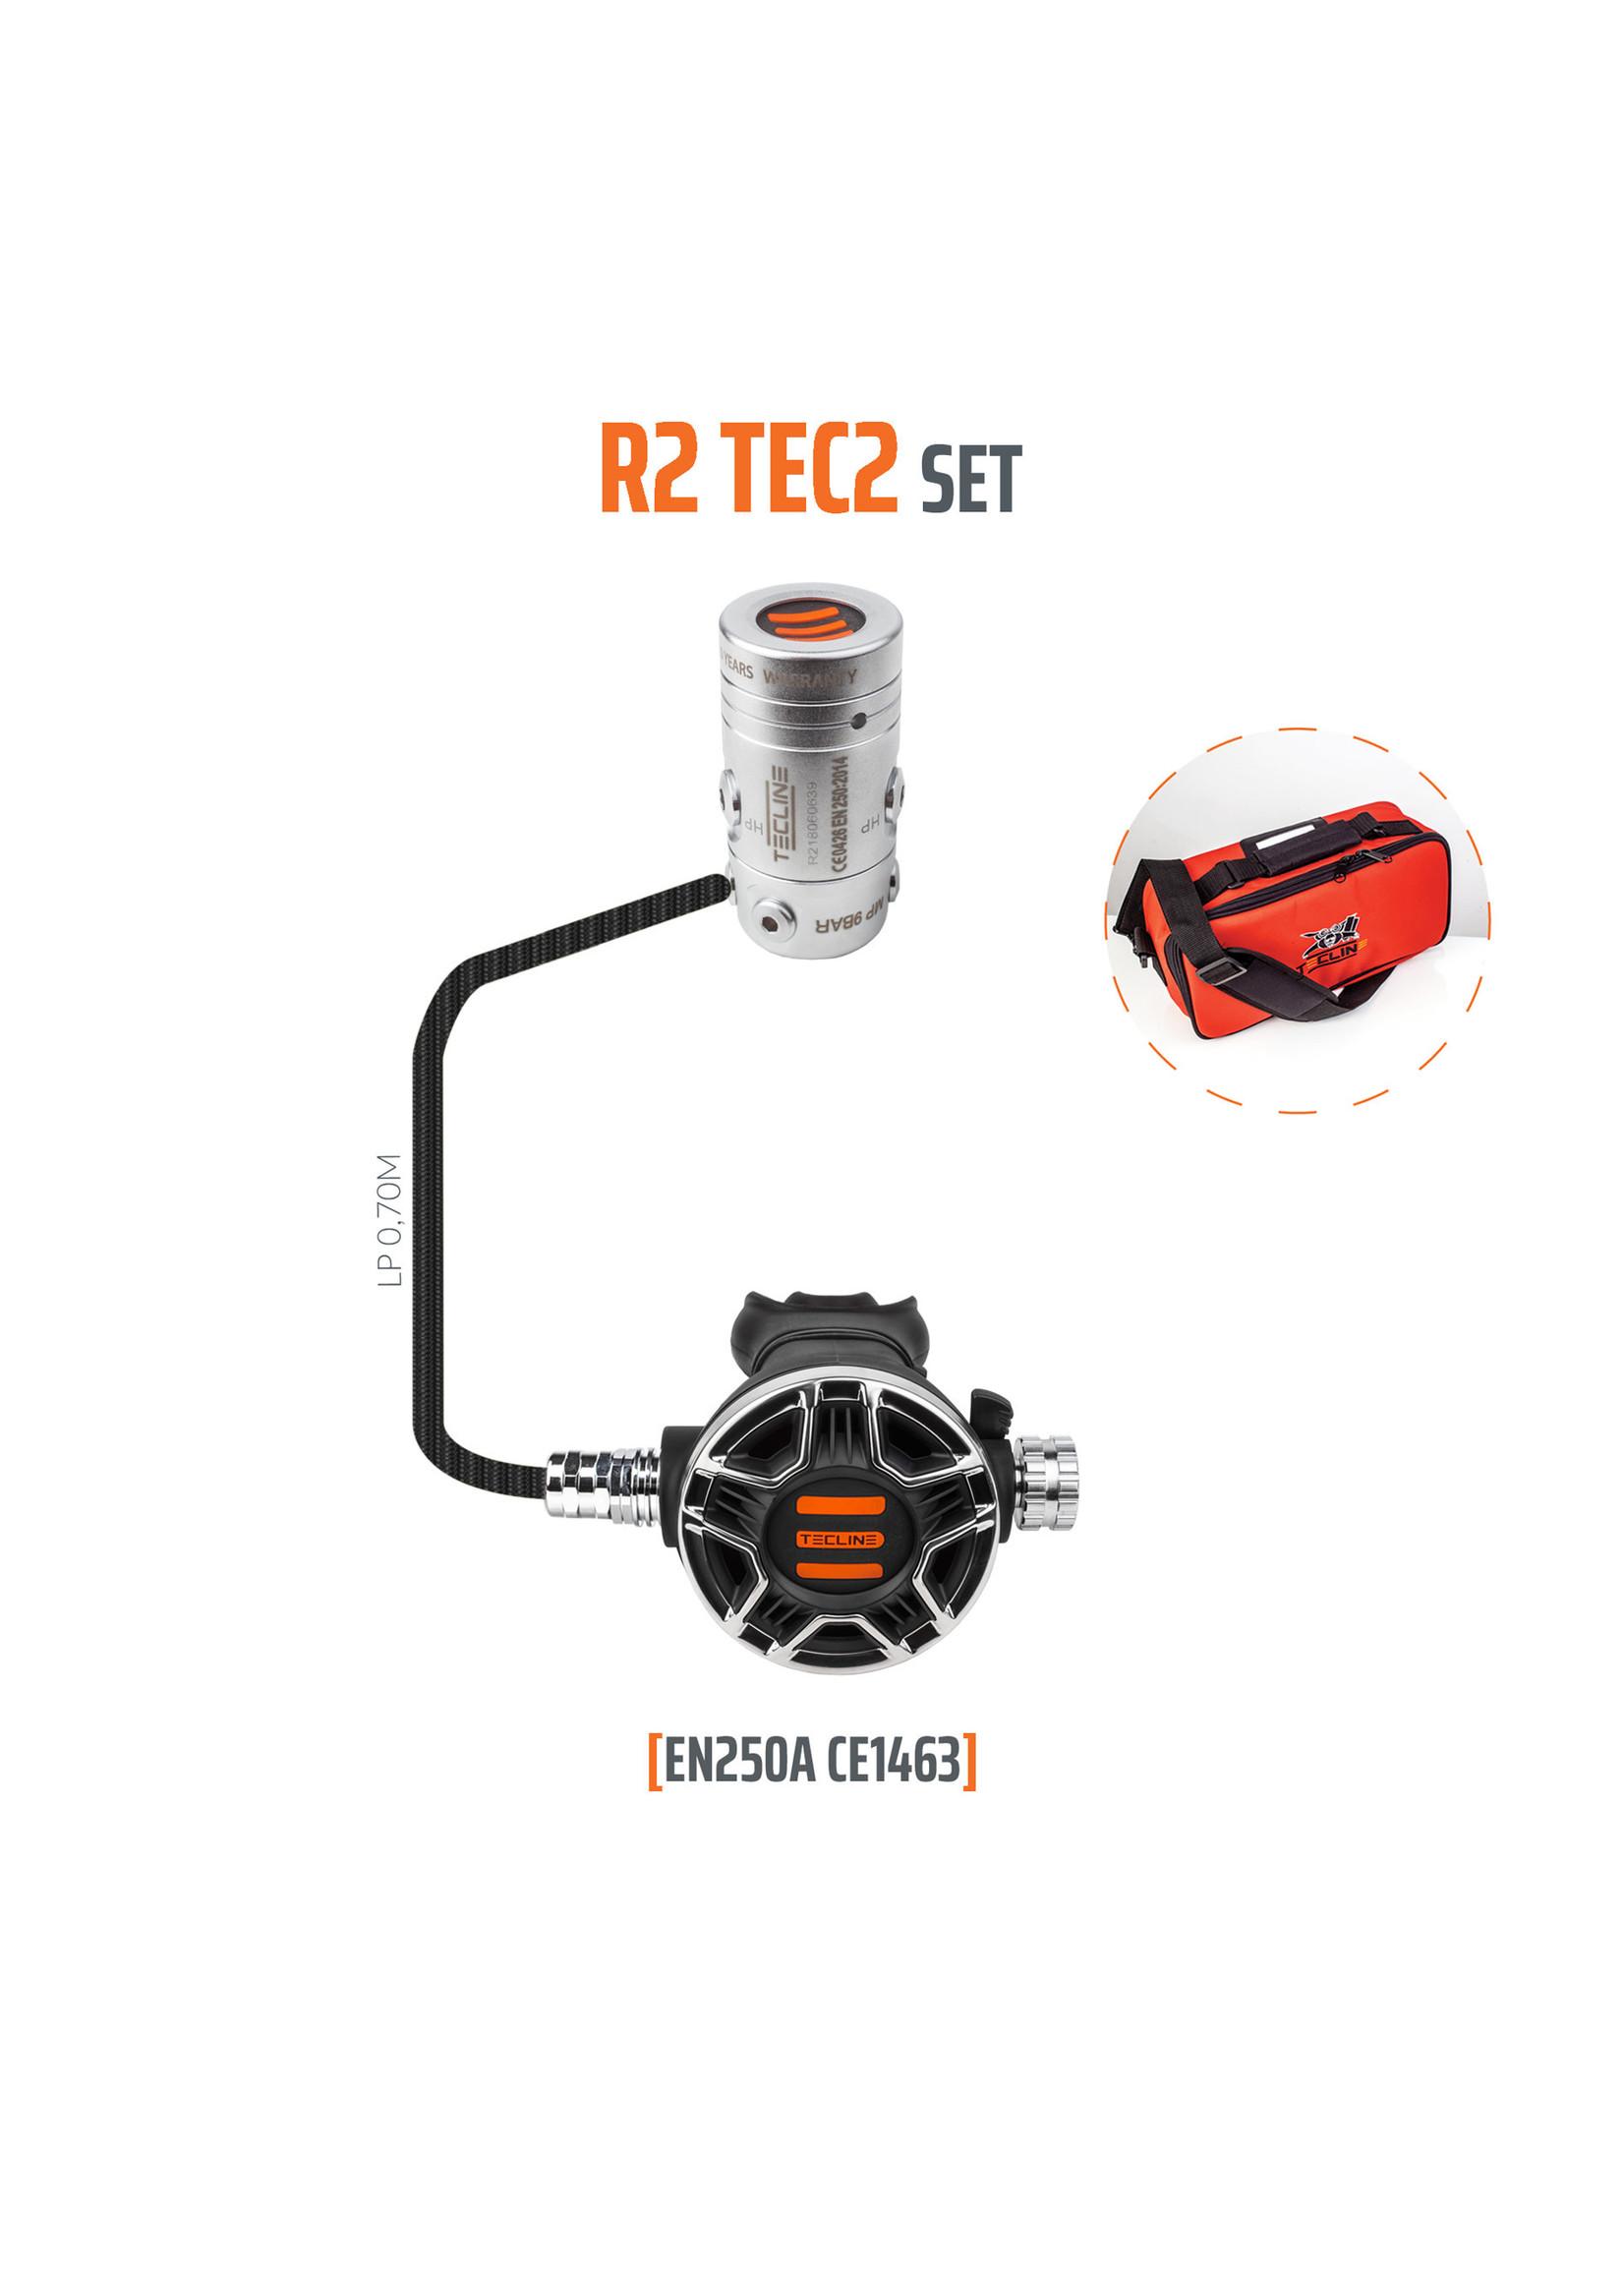 TecLine Tecline R2 TEC2 set